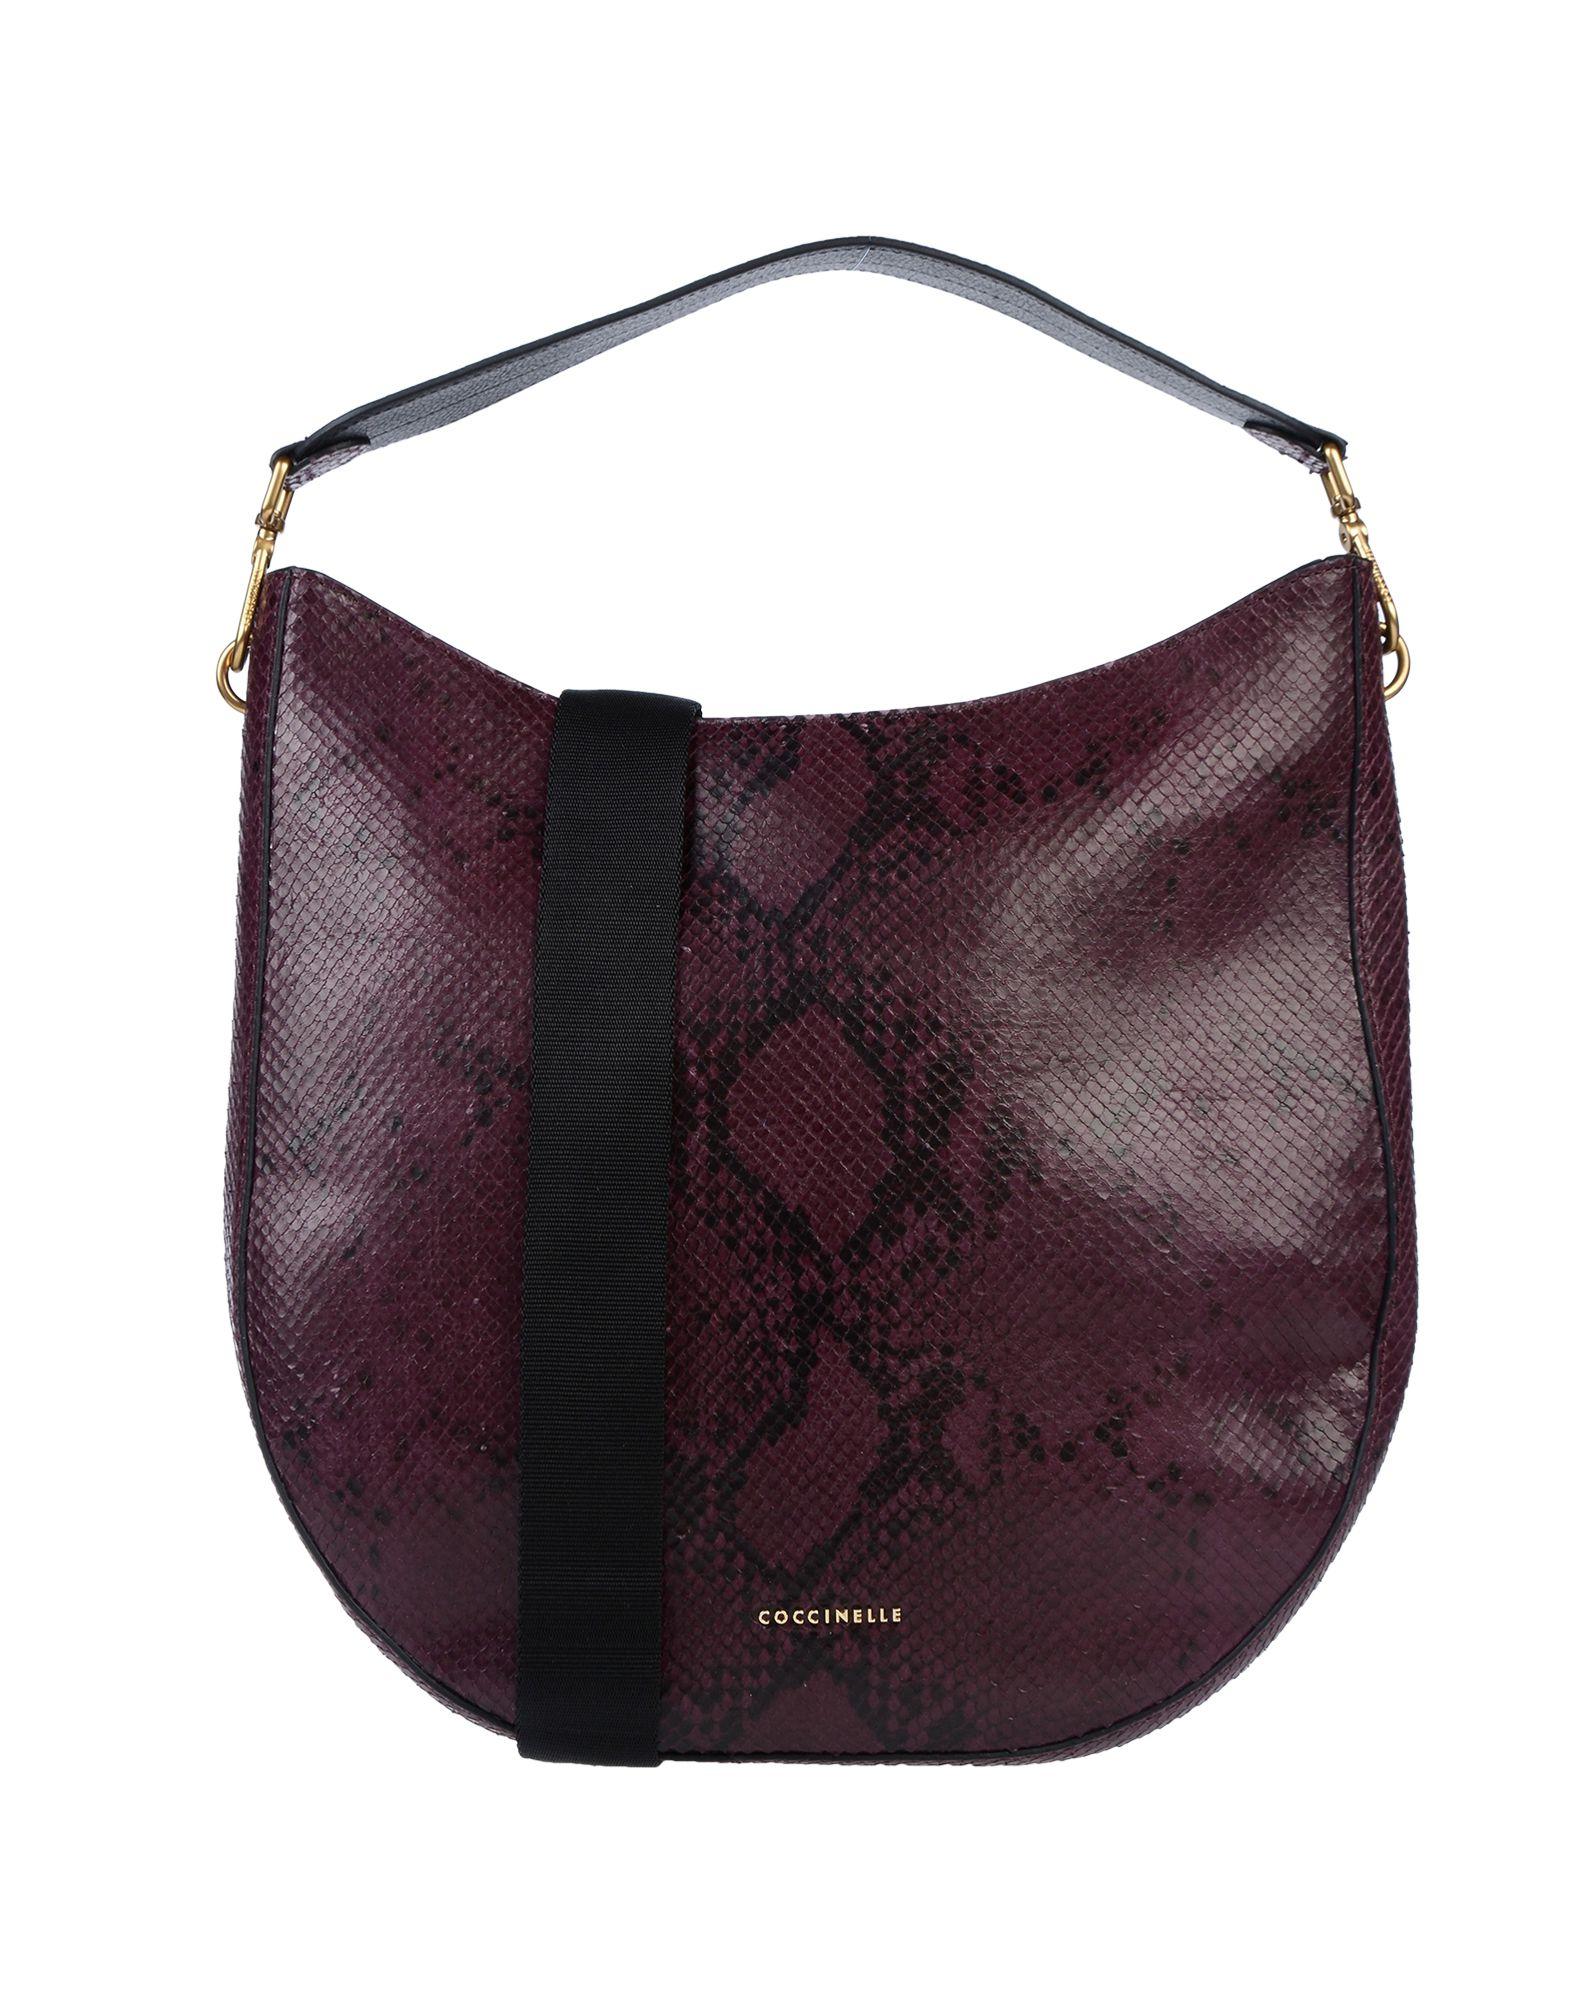 COCCINELLE Сумка на руку горячие корейской леди женщины хобо кожа pu посланника плеча сумки totes кошелек